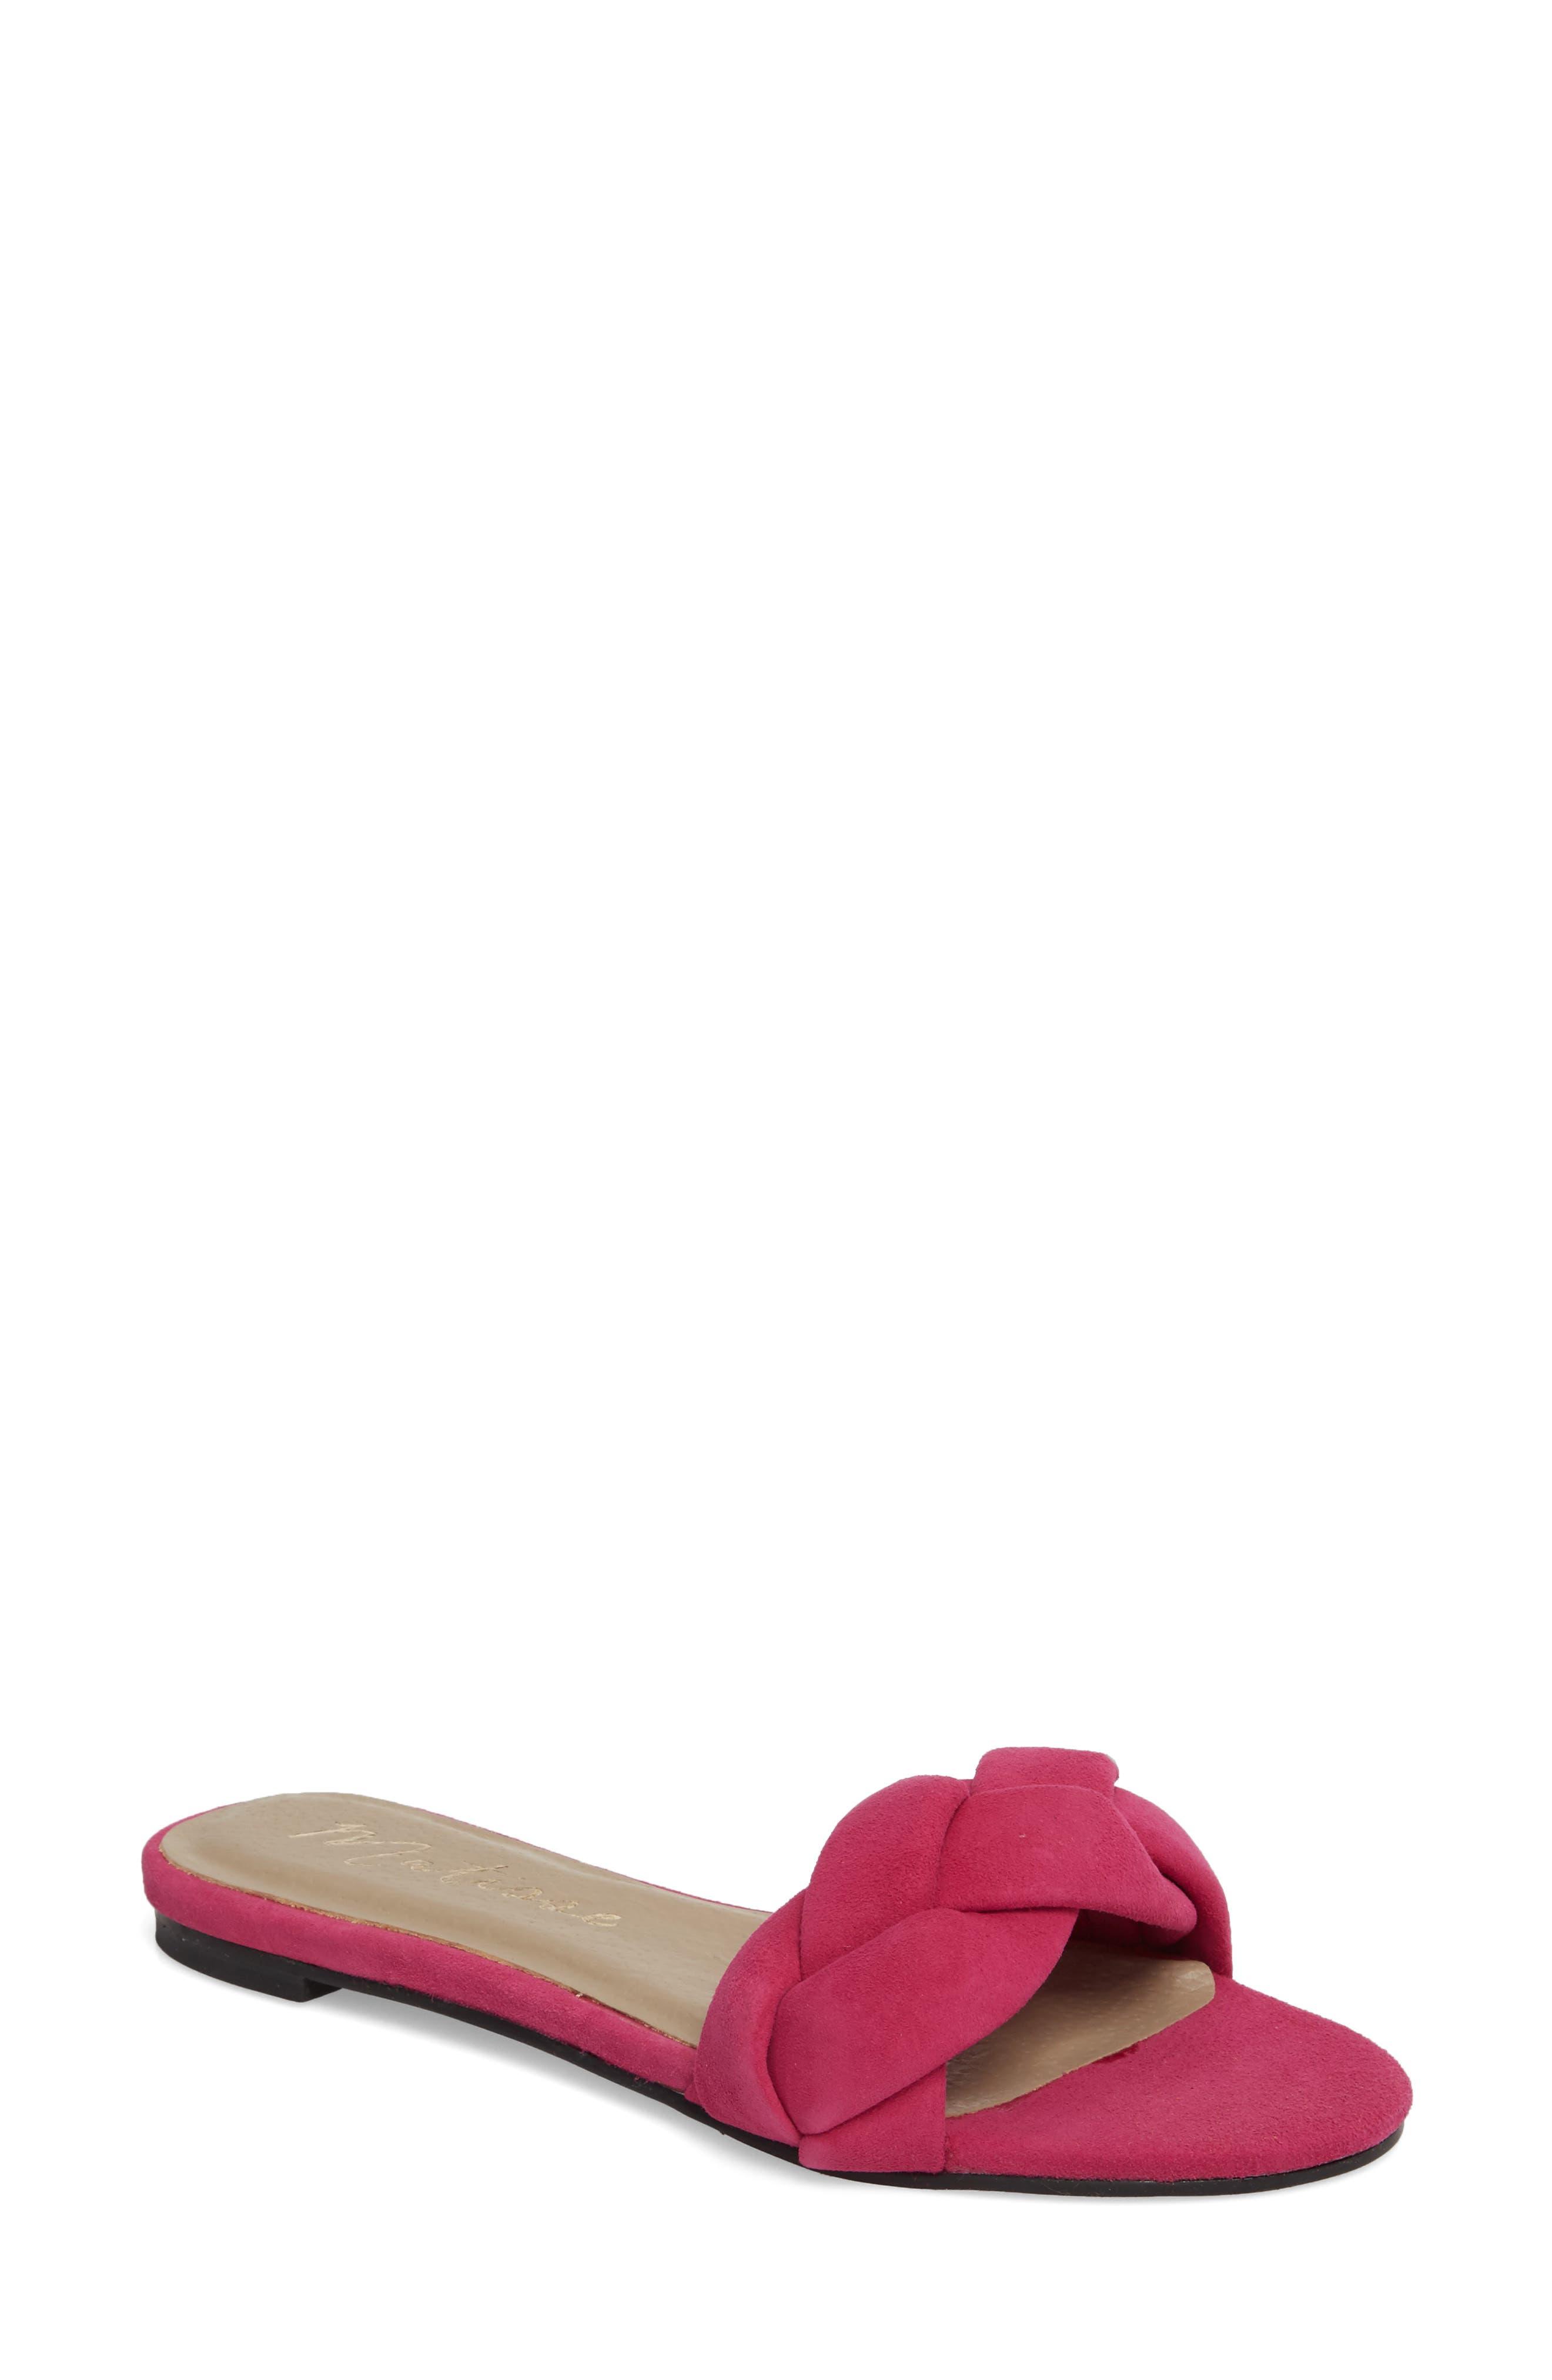 Main Image - Matisse Georgie Slide Sandal (Women)